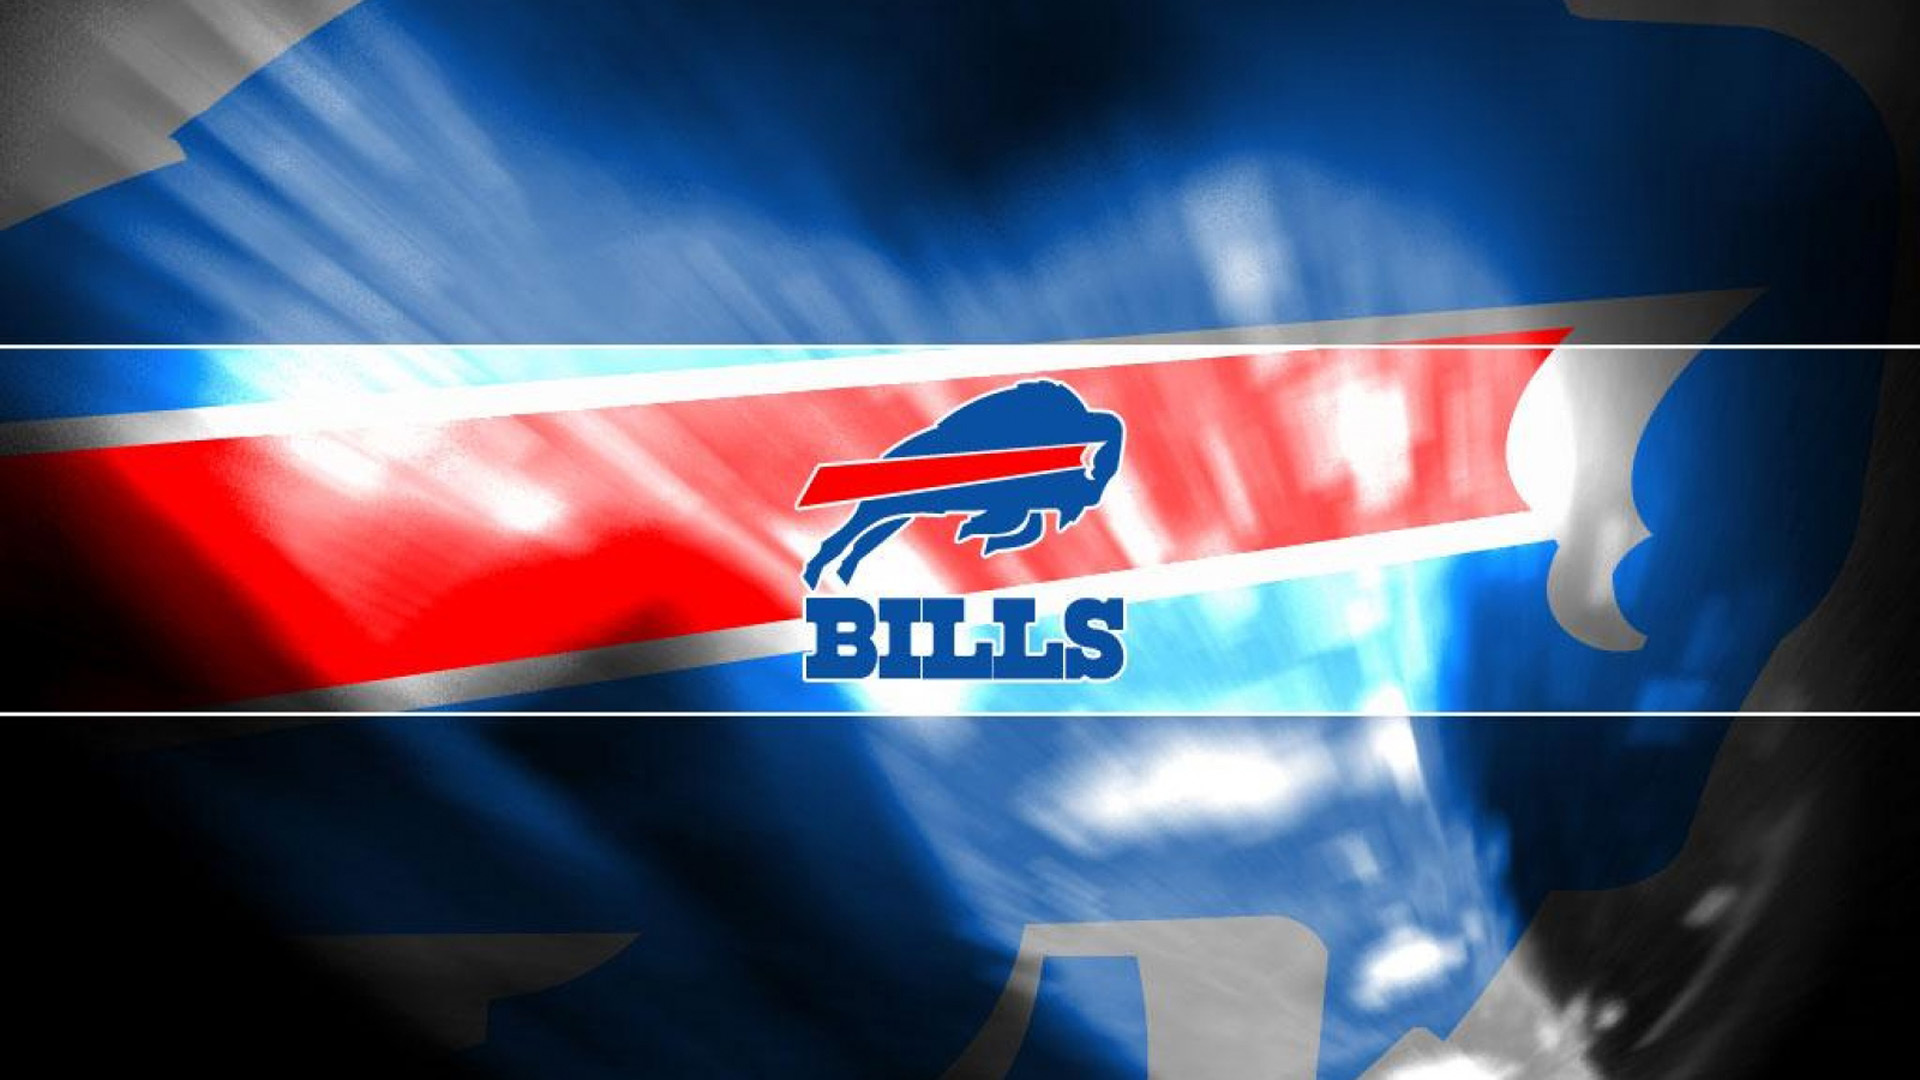 Buffalo Bills Images